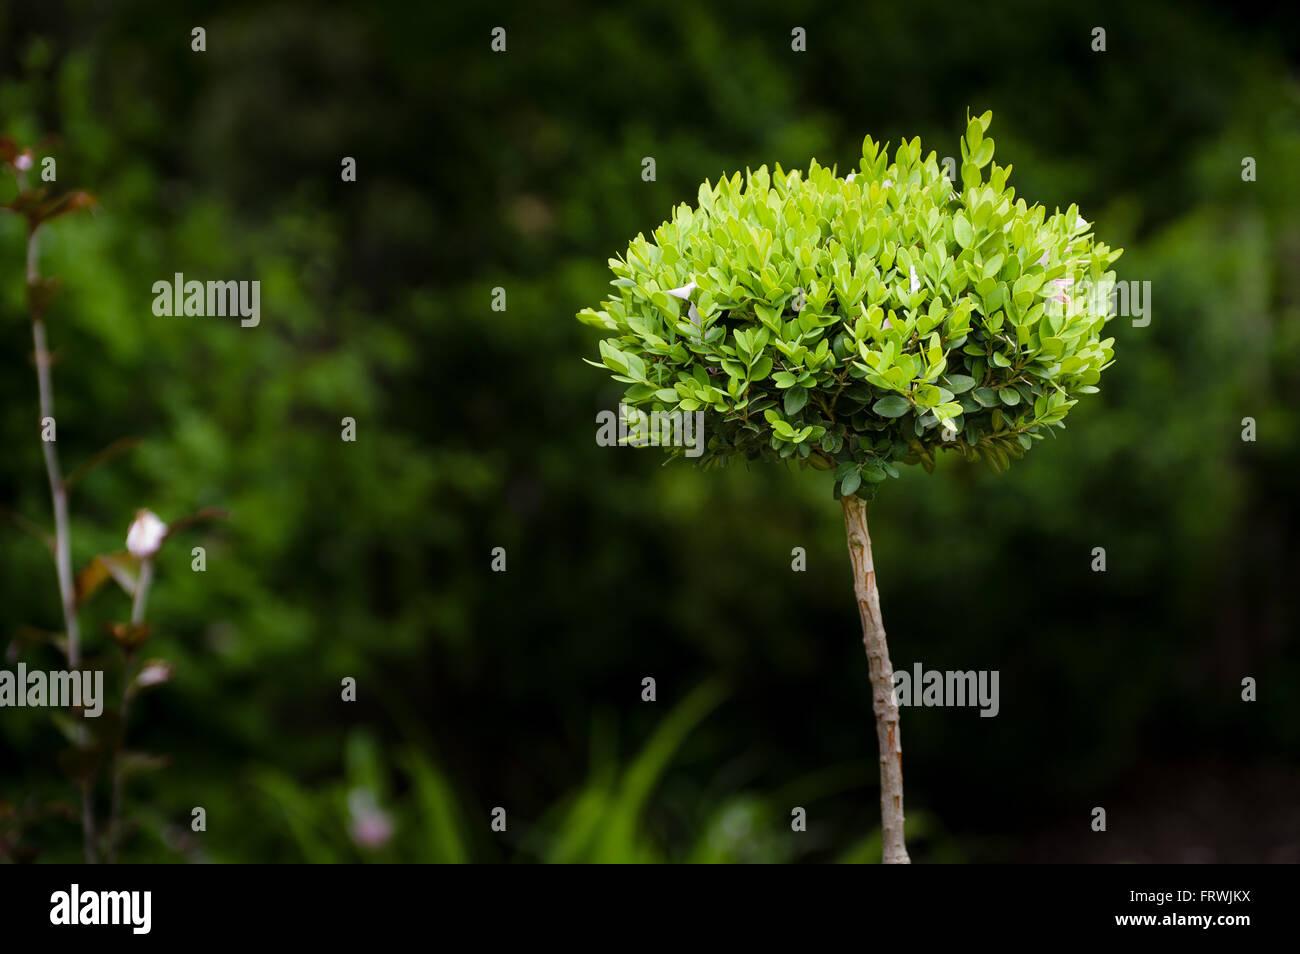 New leaves flourish on a small ornamental bushStock Photo